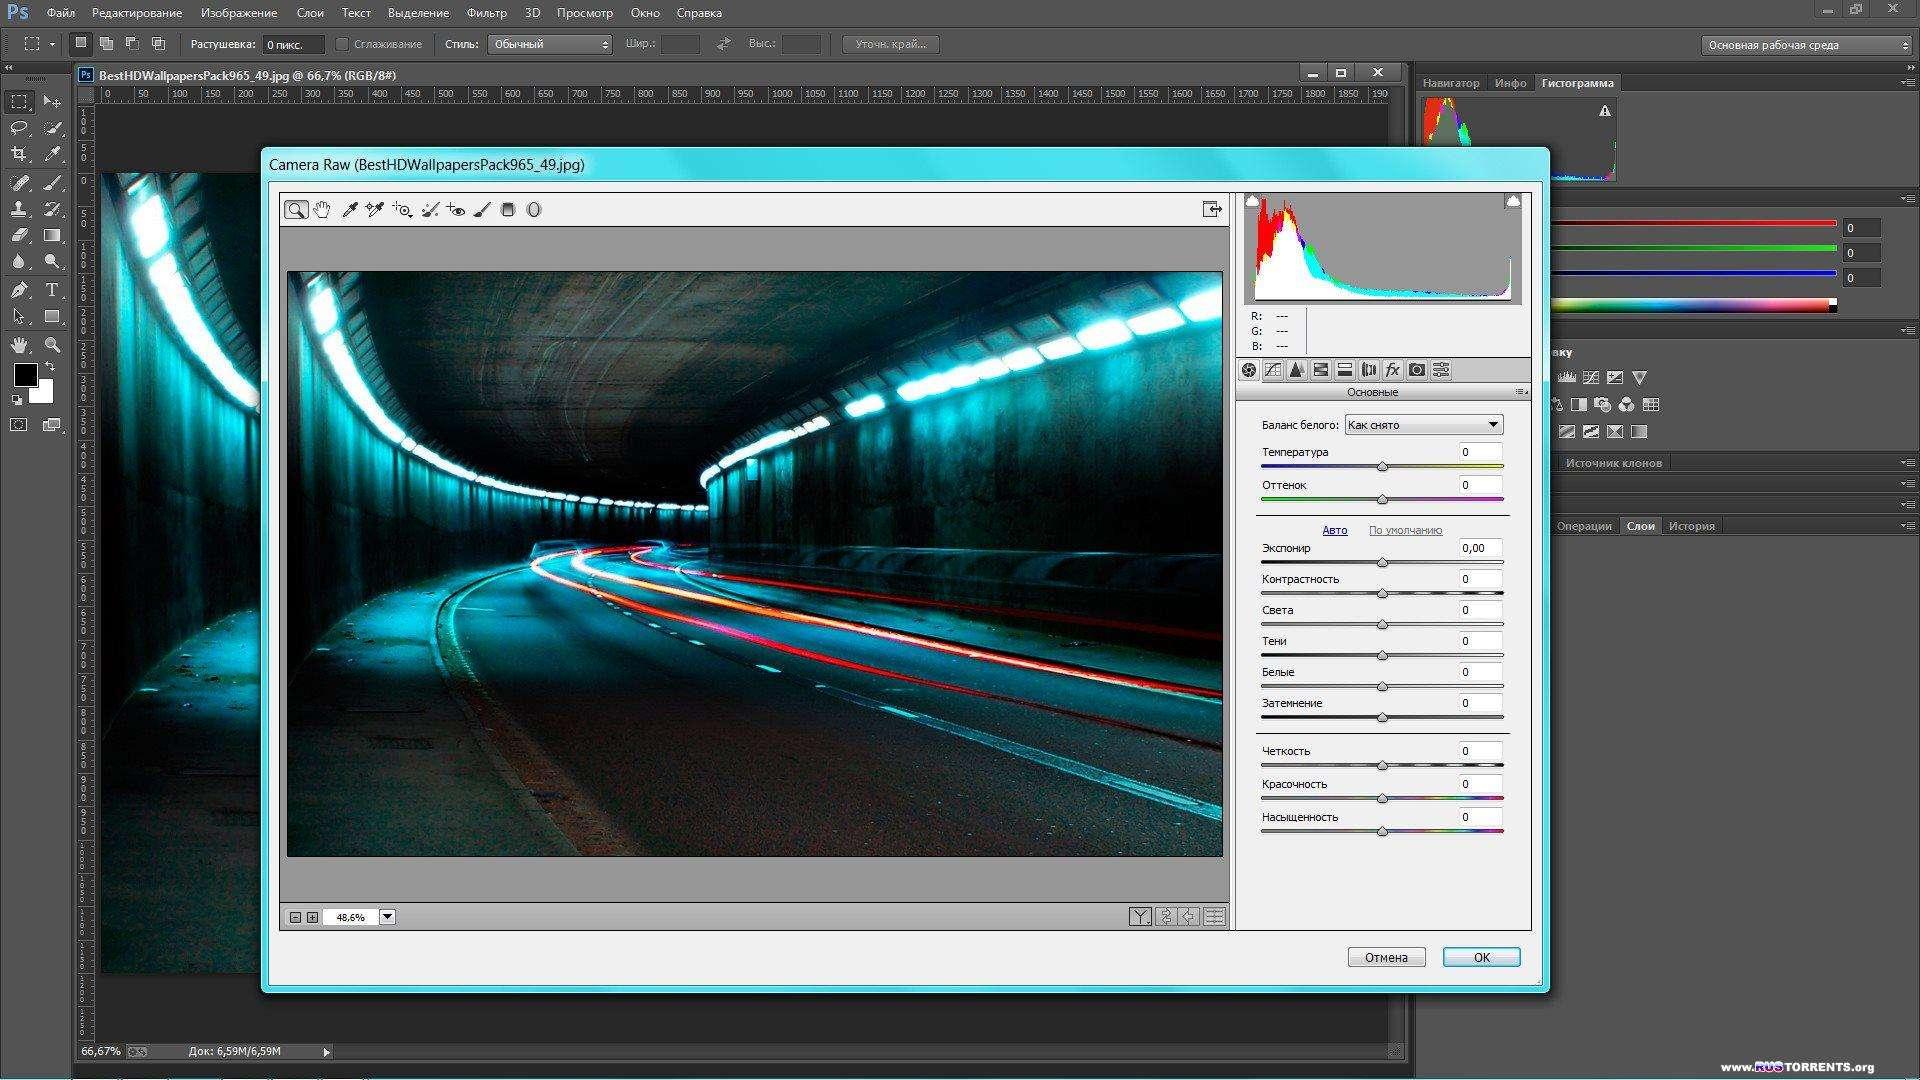 Adobe Photoshop CC 14.2.1 RePack by JFK2005